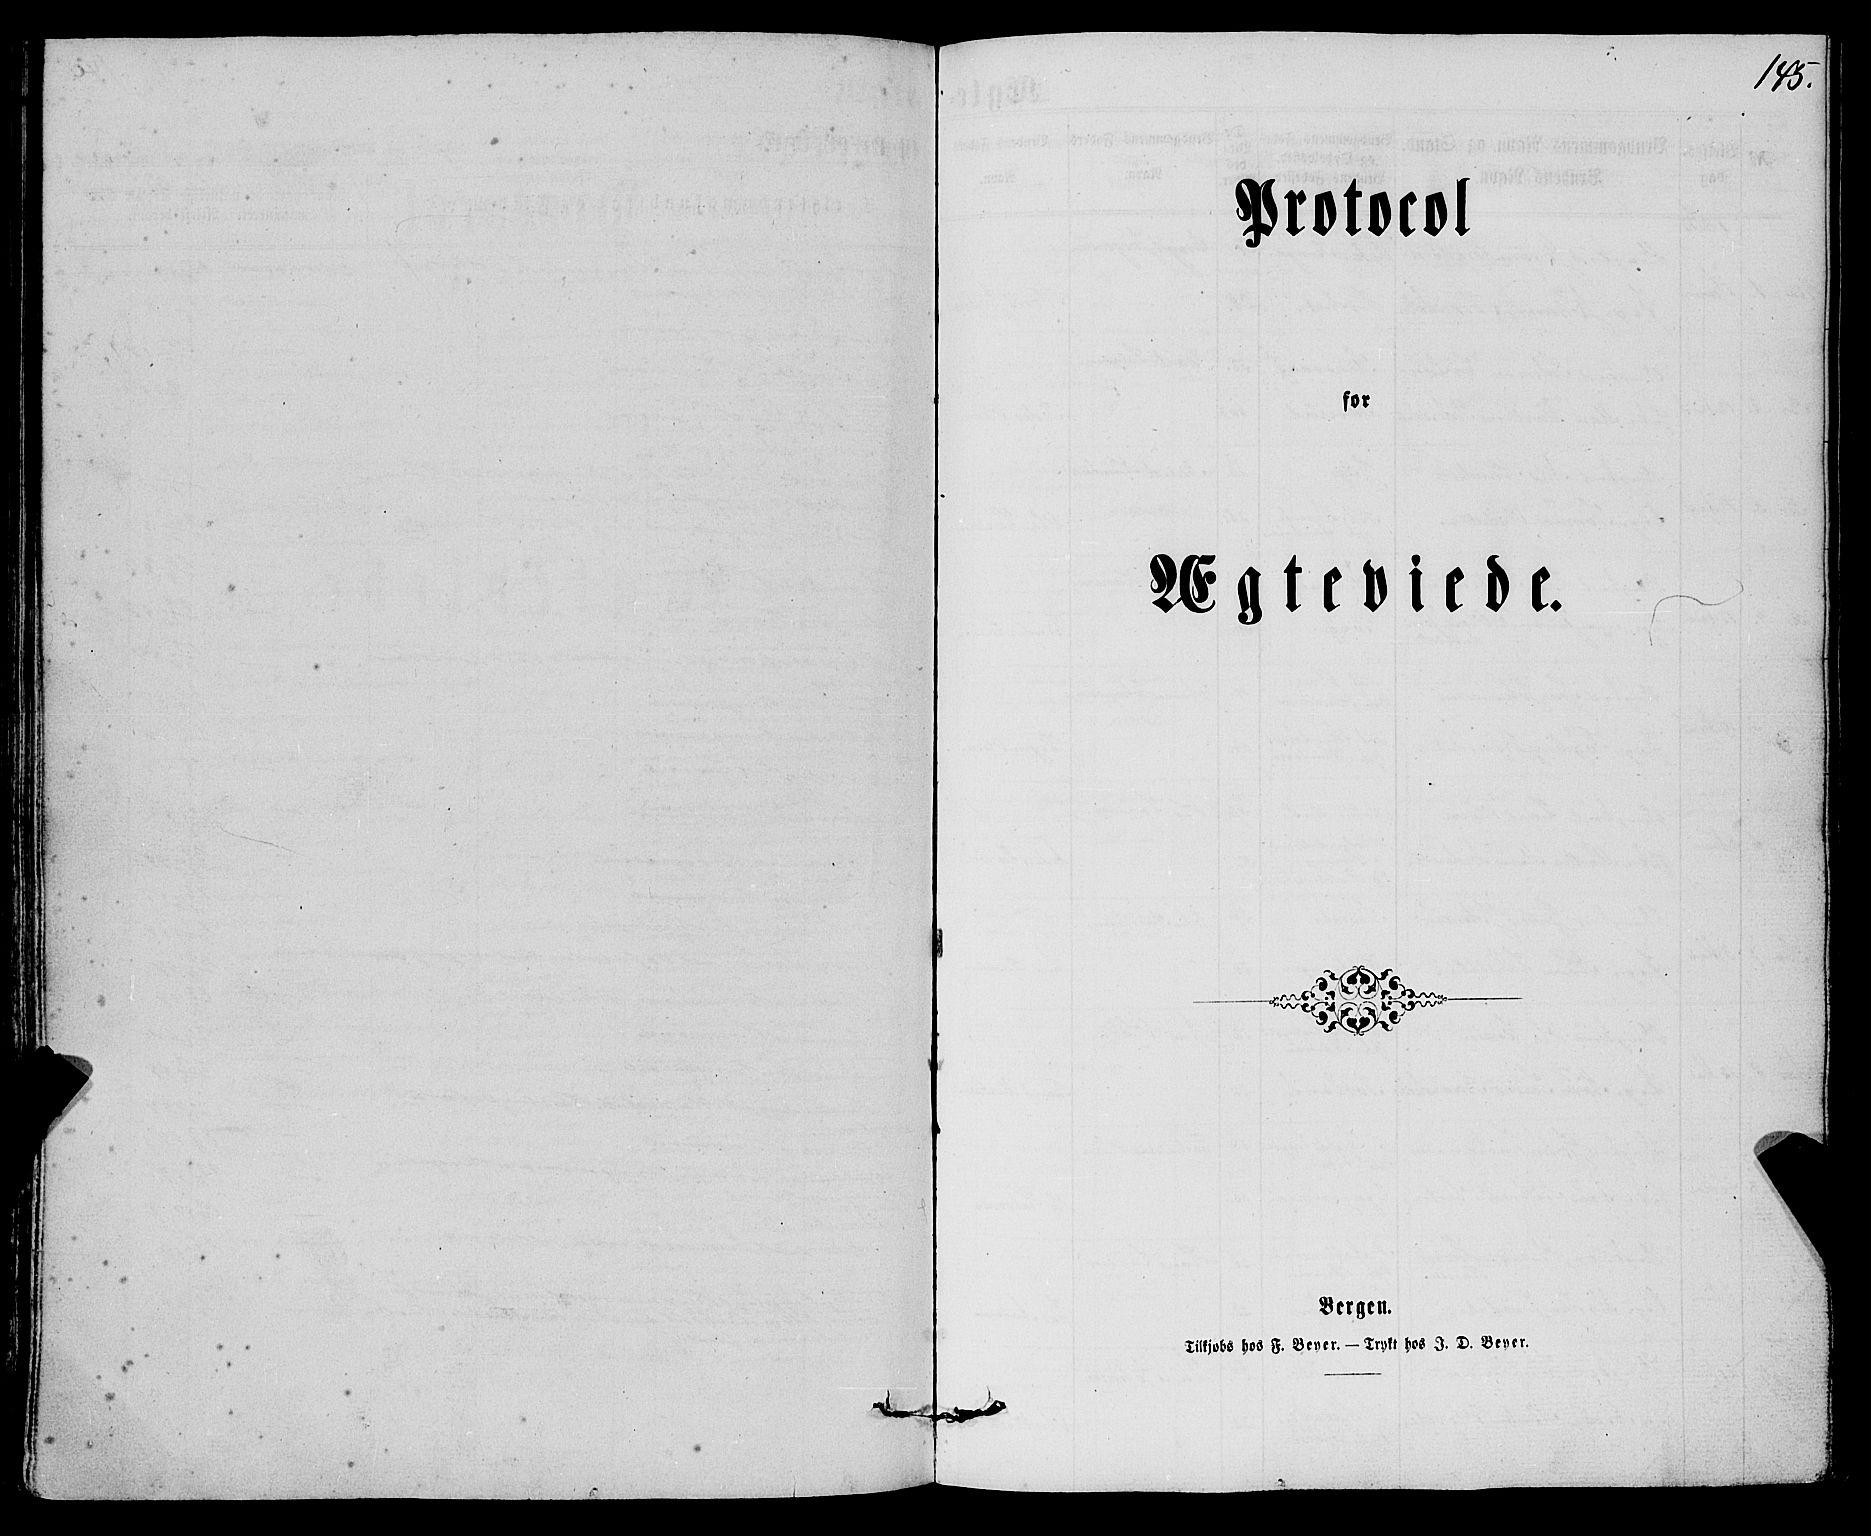 SAB, Finnås sokneprestembete, H/Ha/Haa/Haaa/L0008: Ministerialbok nr. A 8, 1863-1872, s. 145